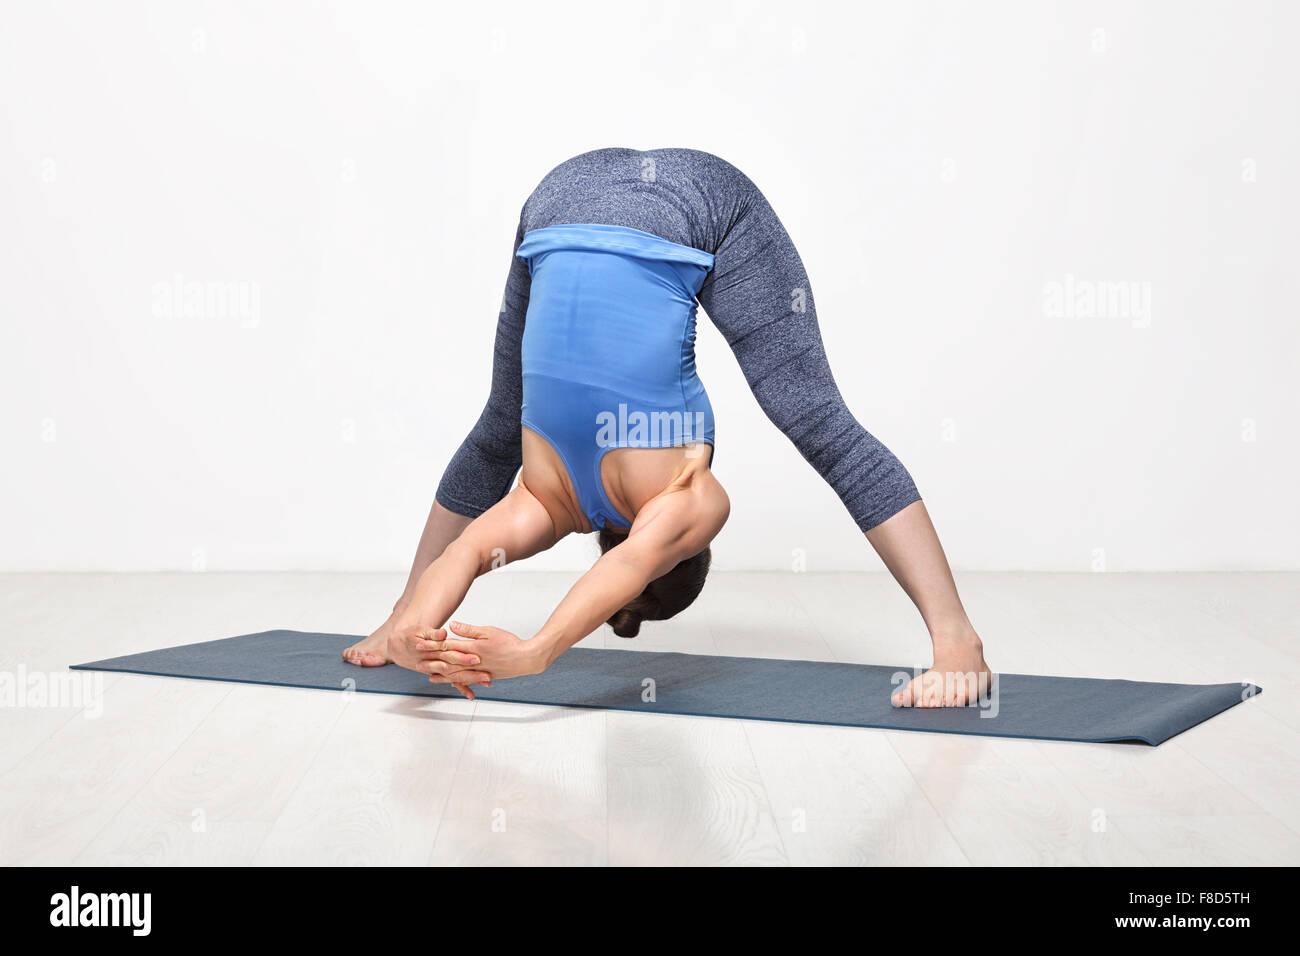 Woman practices Ashtanga Vinyasa yoga asana - Stock Image